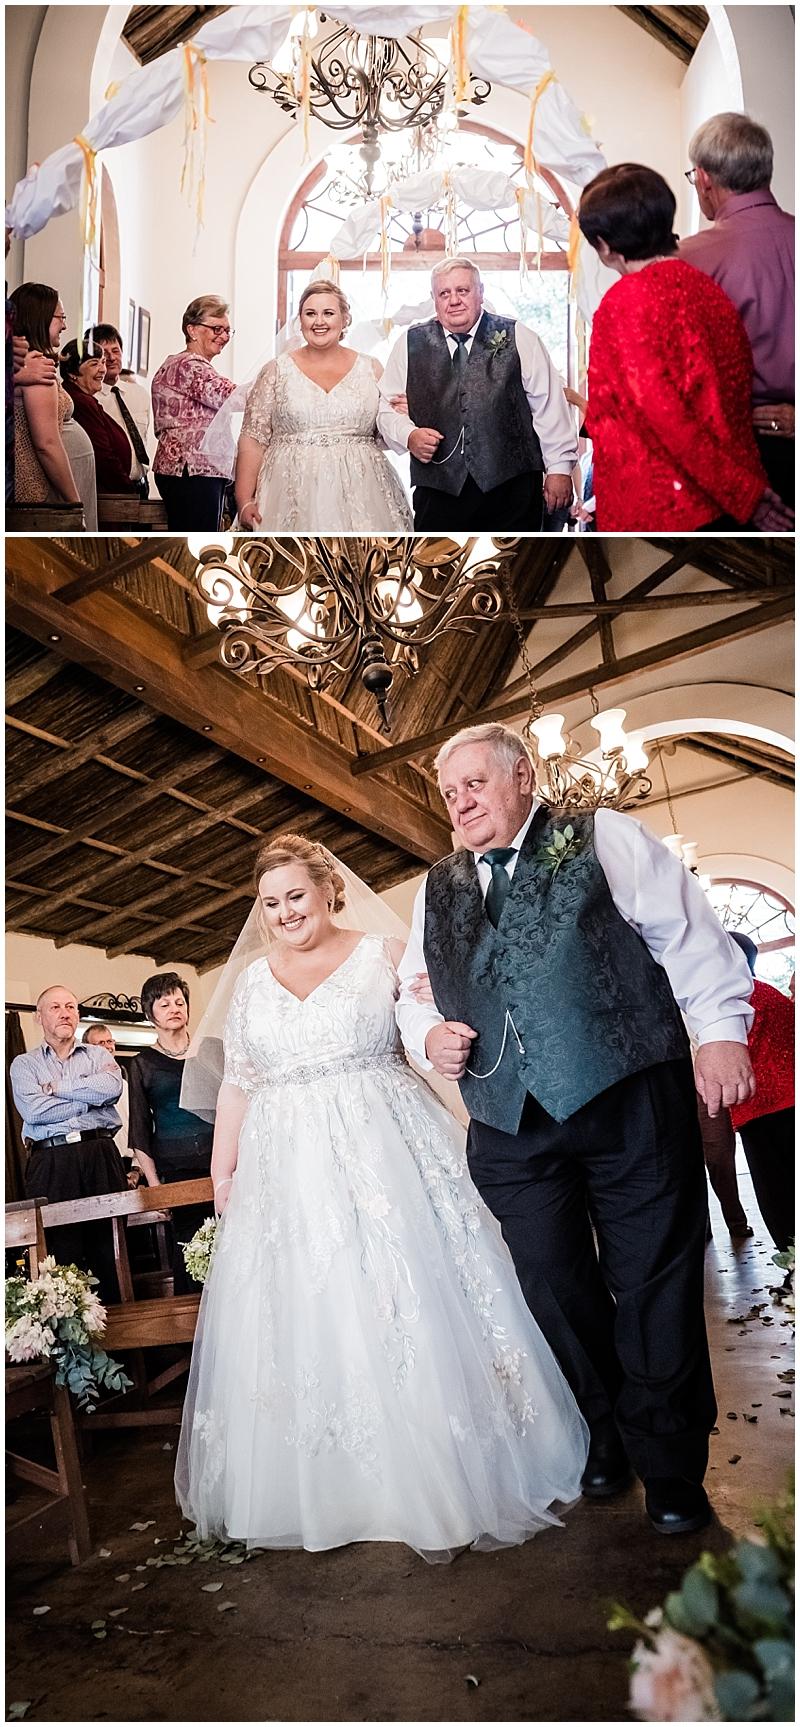 AlexanderSmith-129_AlexanderSmith Best Wedding Photographer-1.jpg